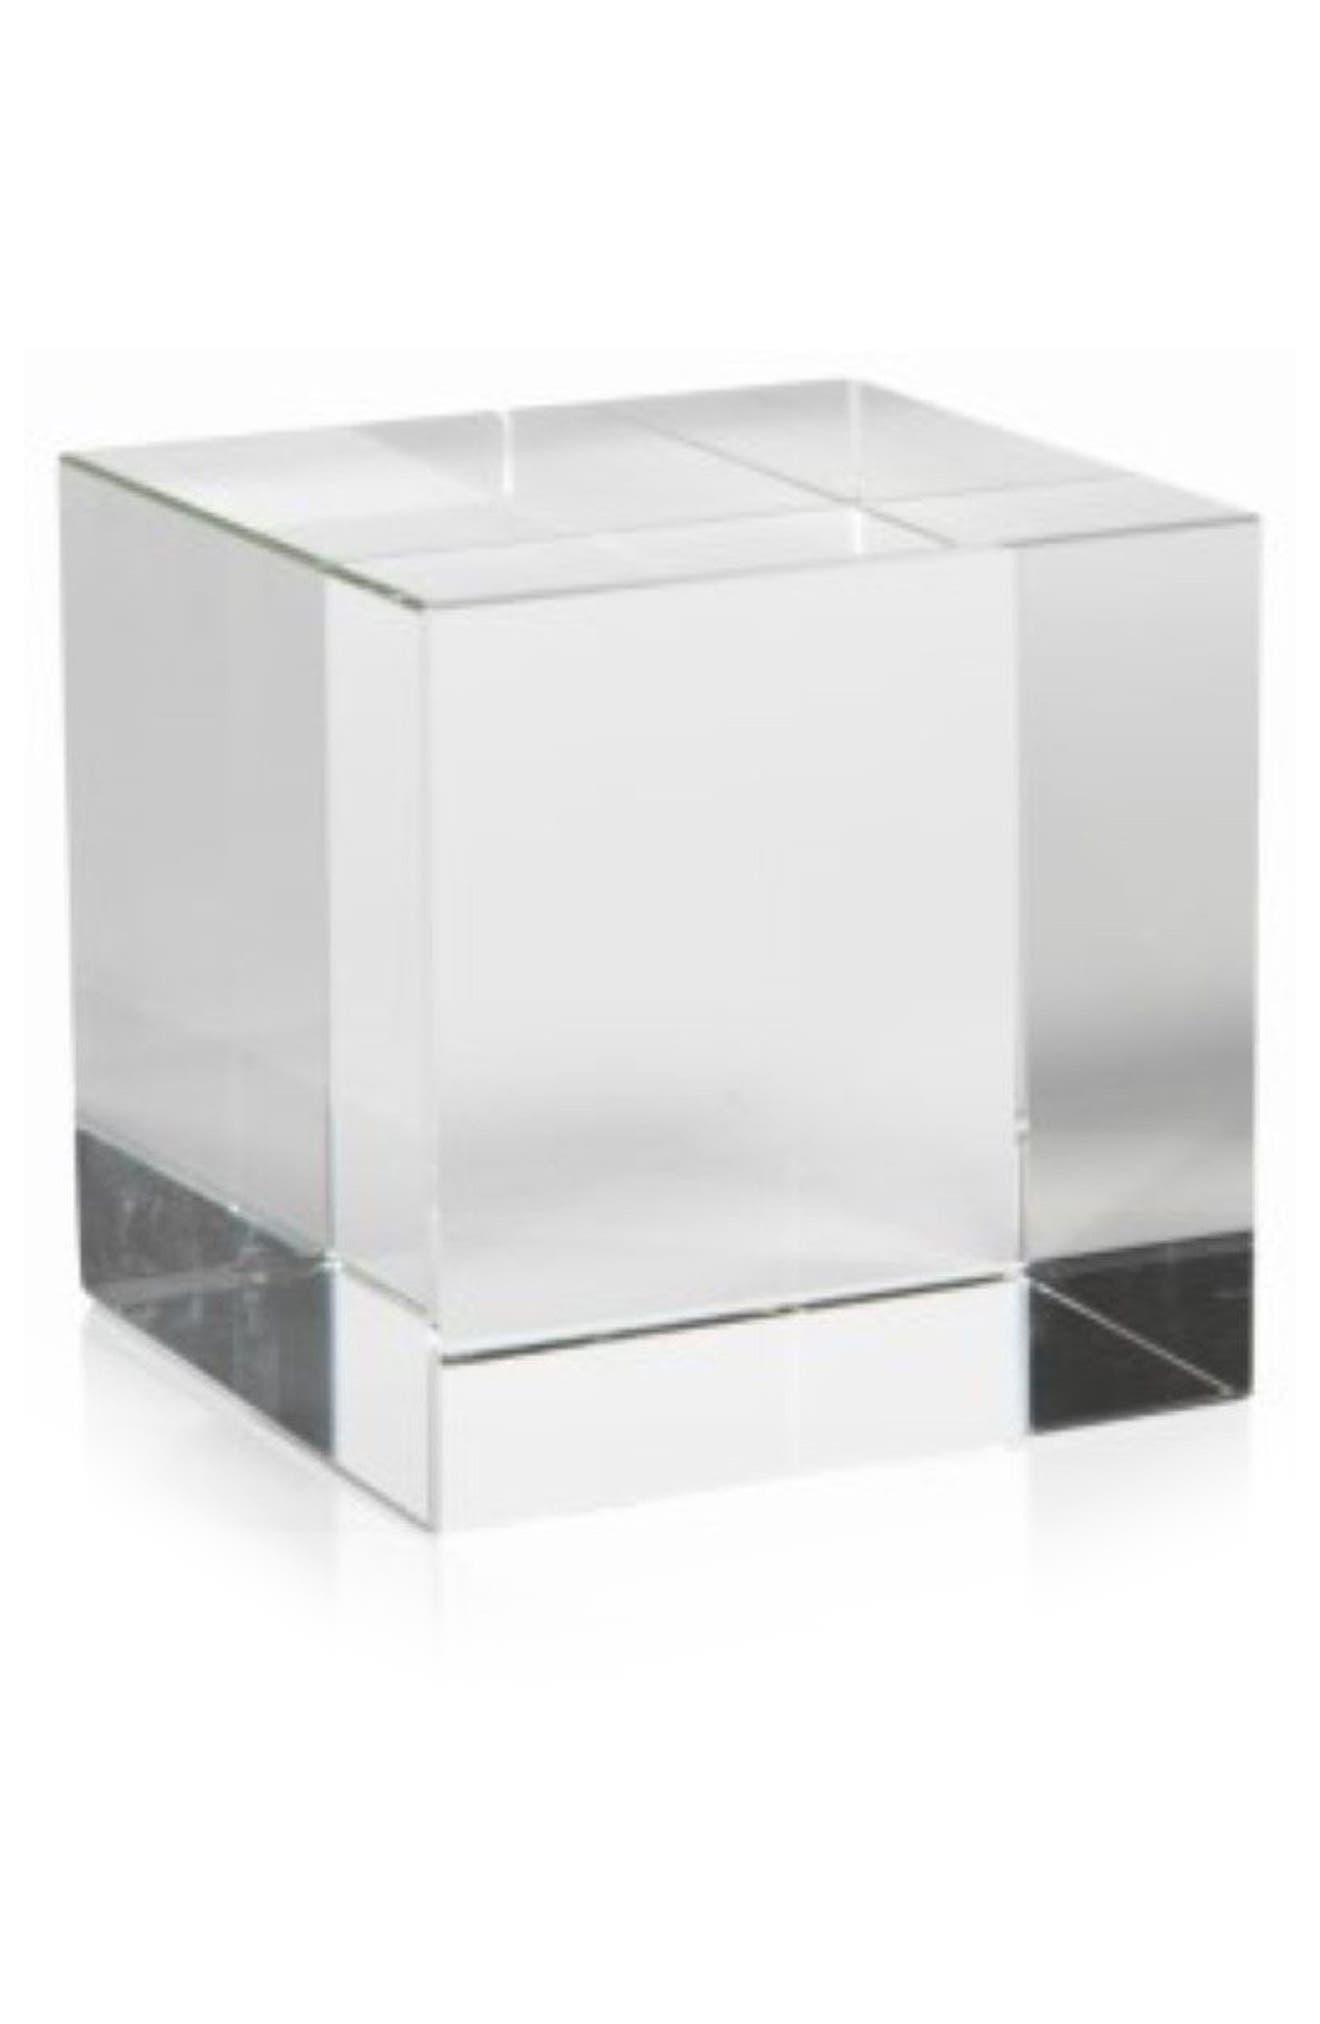 Main Image - Zodax Jacy Glass Cube Decoration